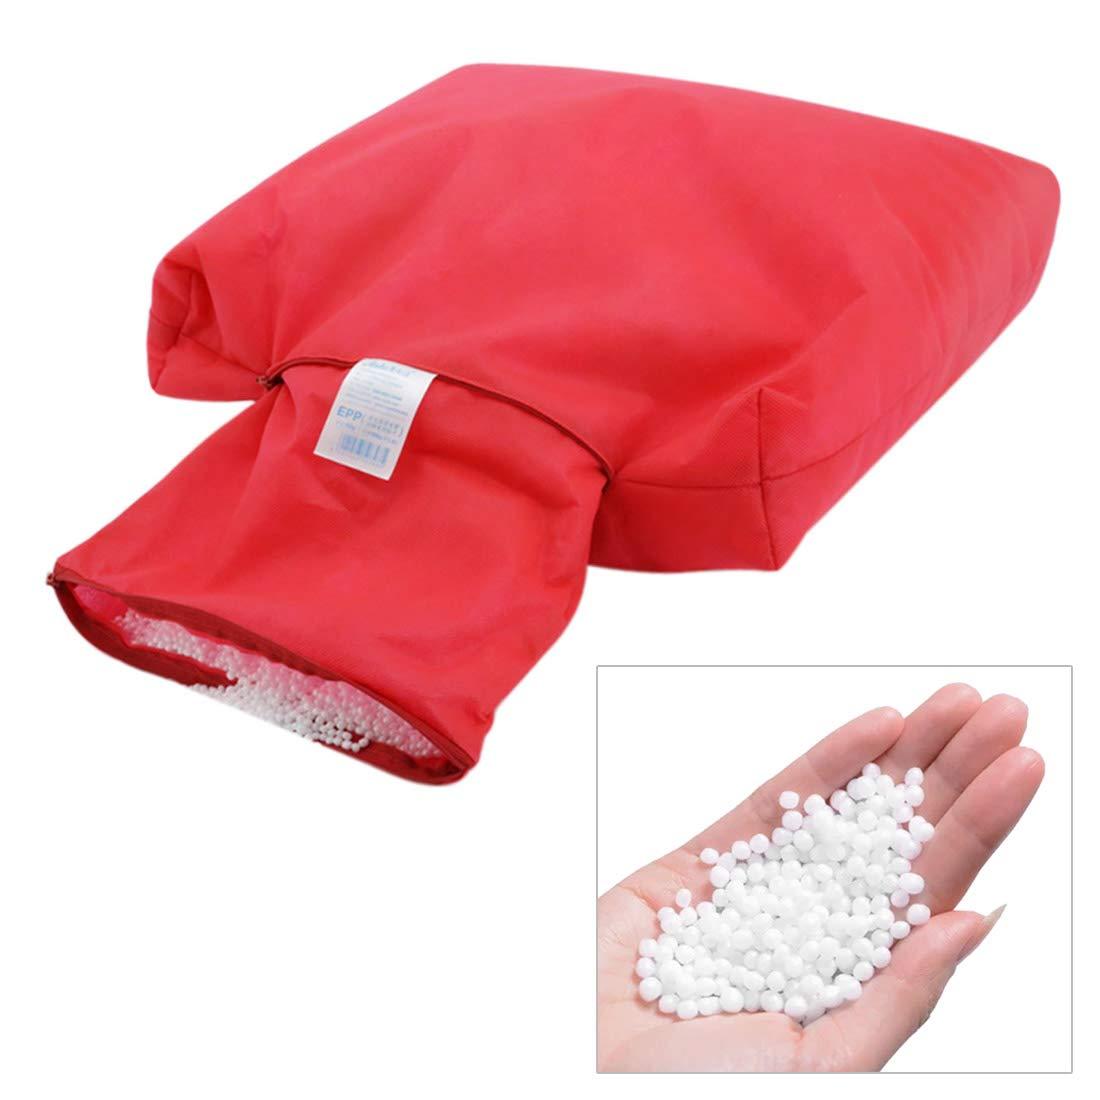 Enerhu Styrofoam Particles Bean Bag Filler Soft Bean Bags Refill (25L(250G), White)